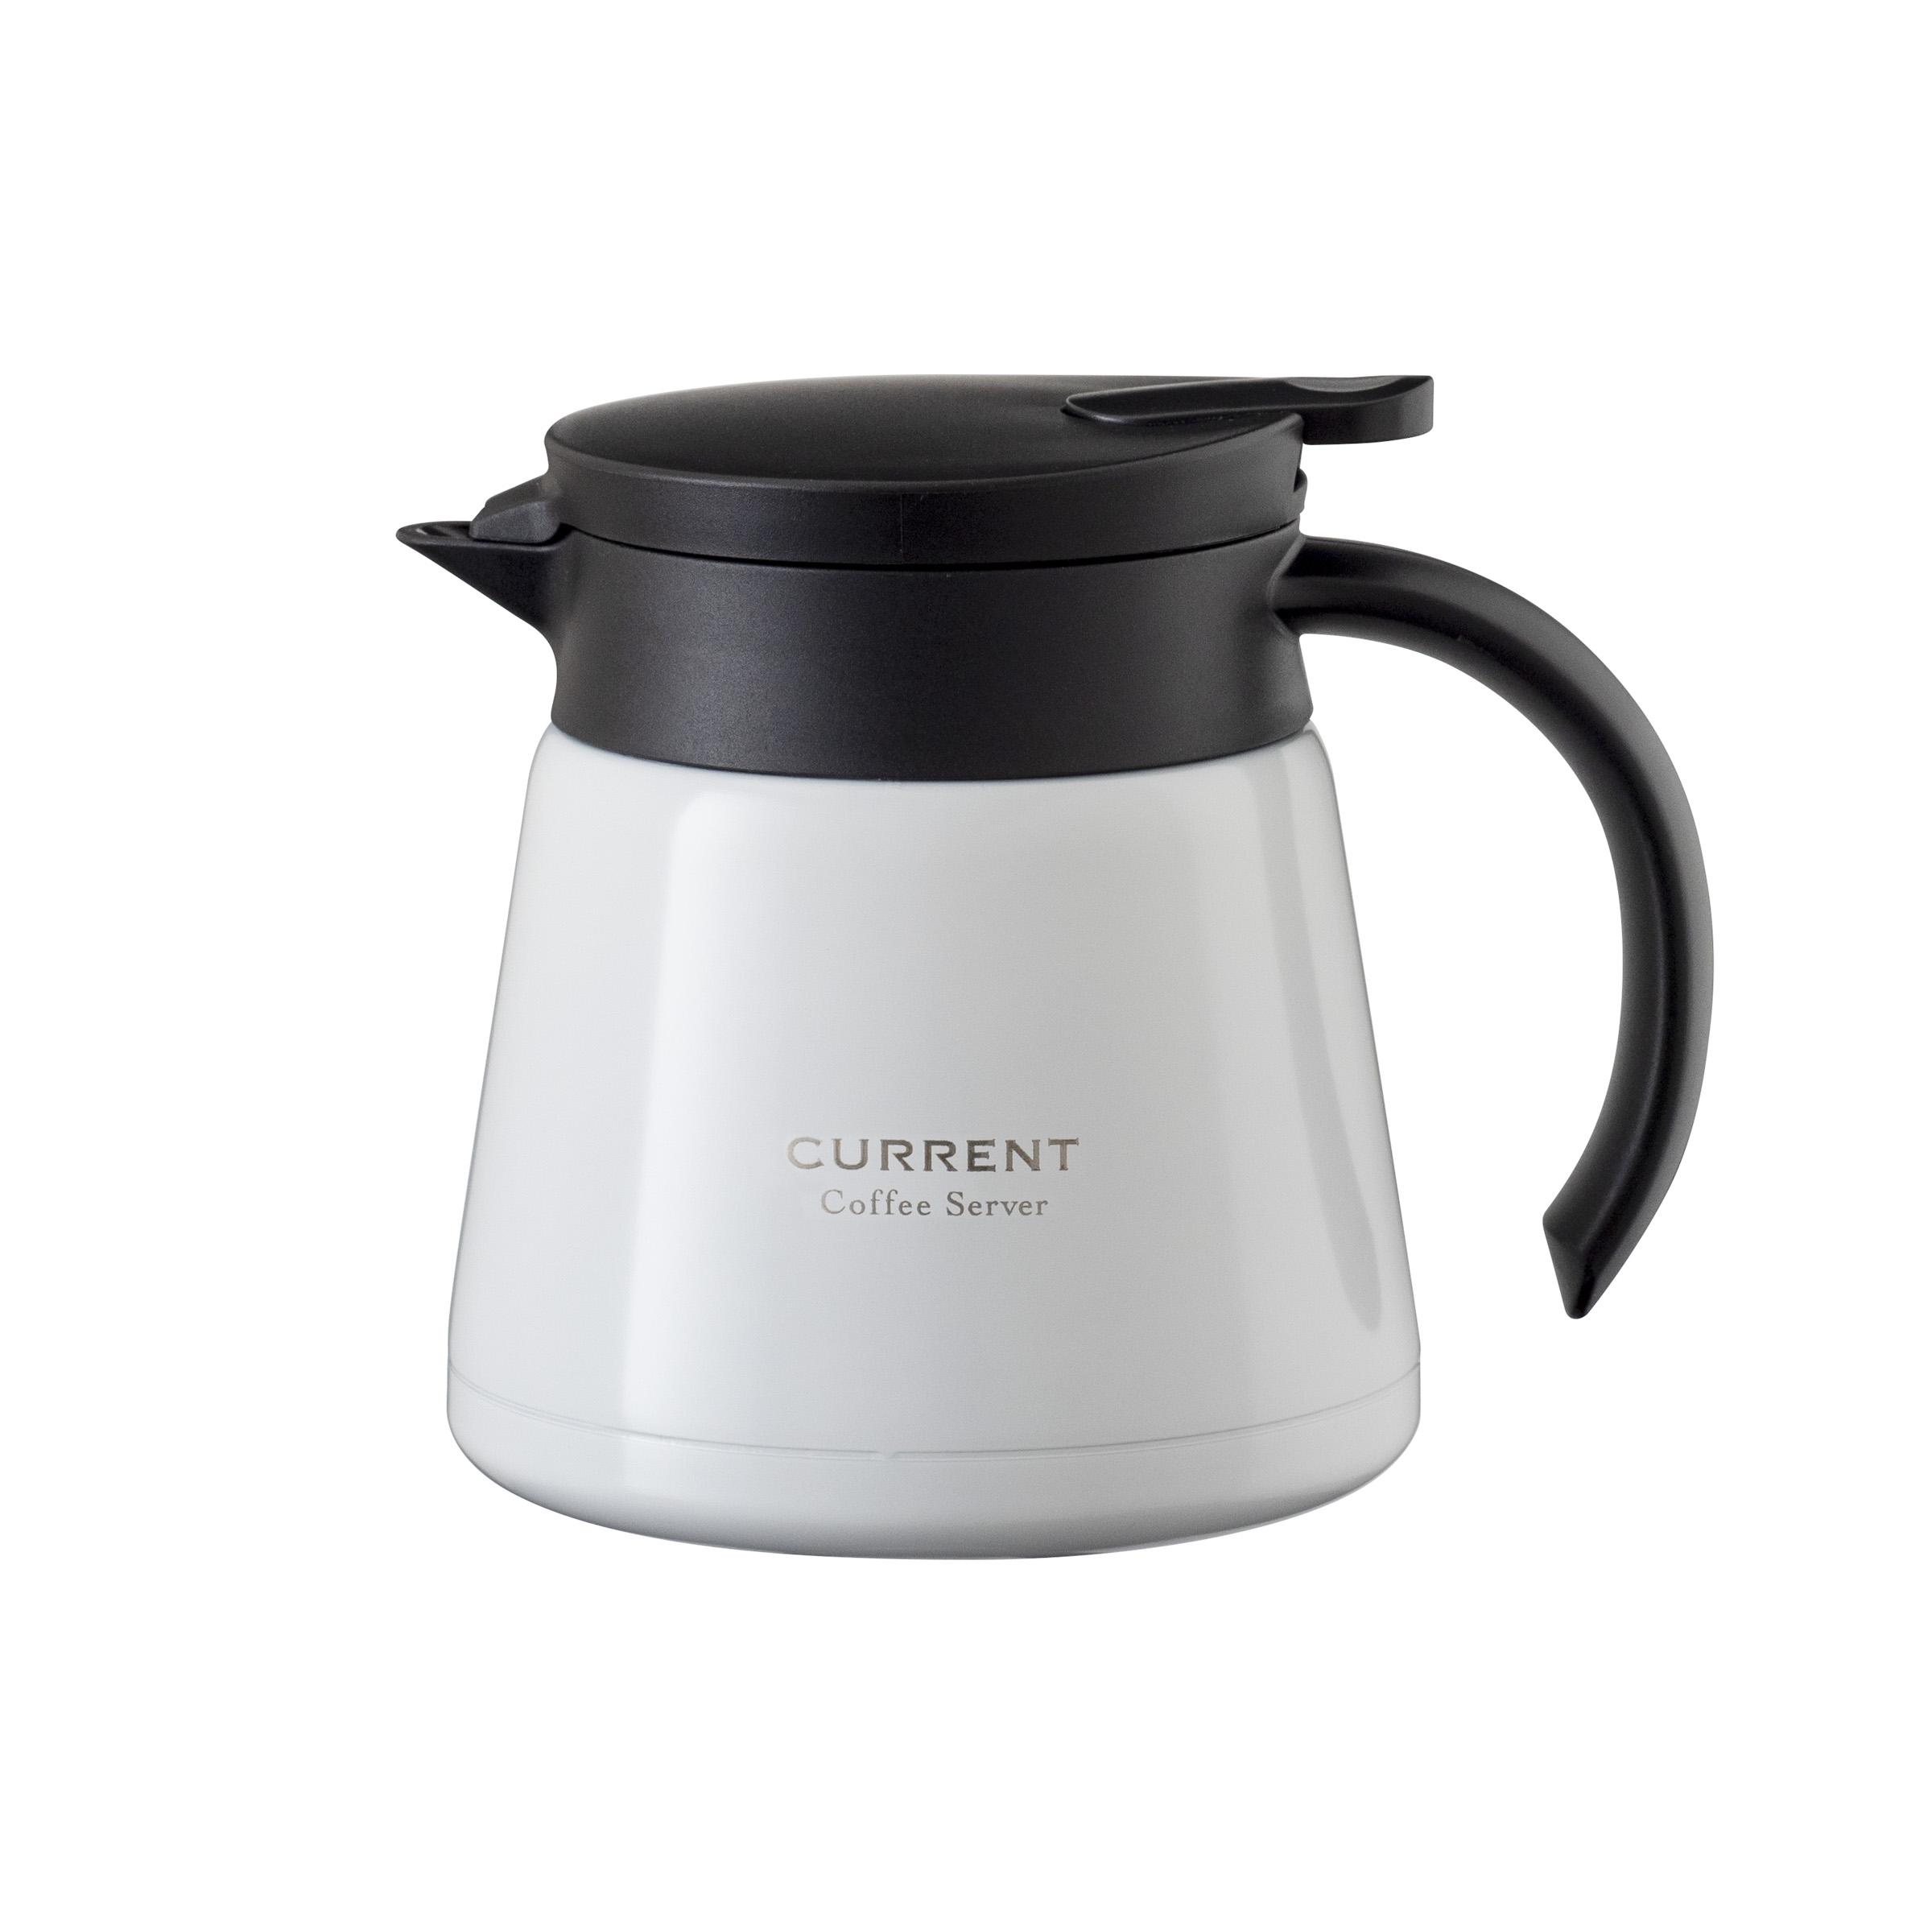 CURRENT コーヒーサーバー 600ml ホワイト